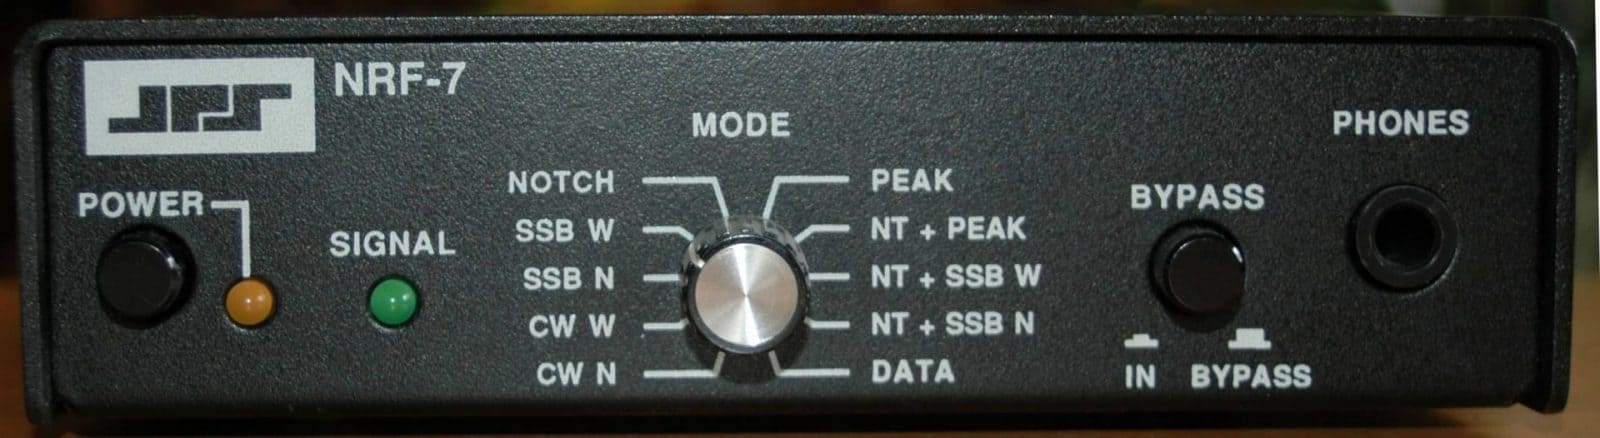 4493462158 6f538e0e79 o - Audio Enhancement vs Clarification; The Audio Filtering Process